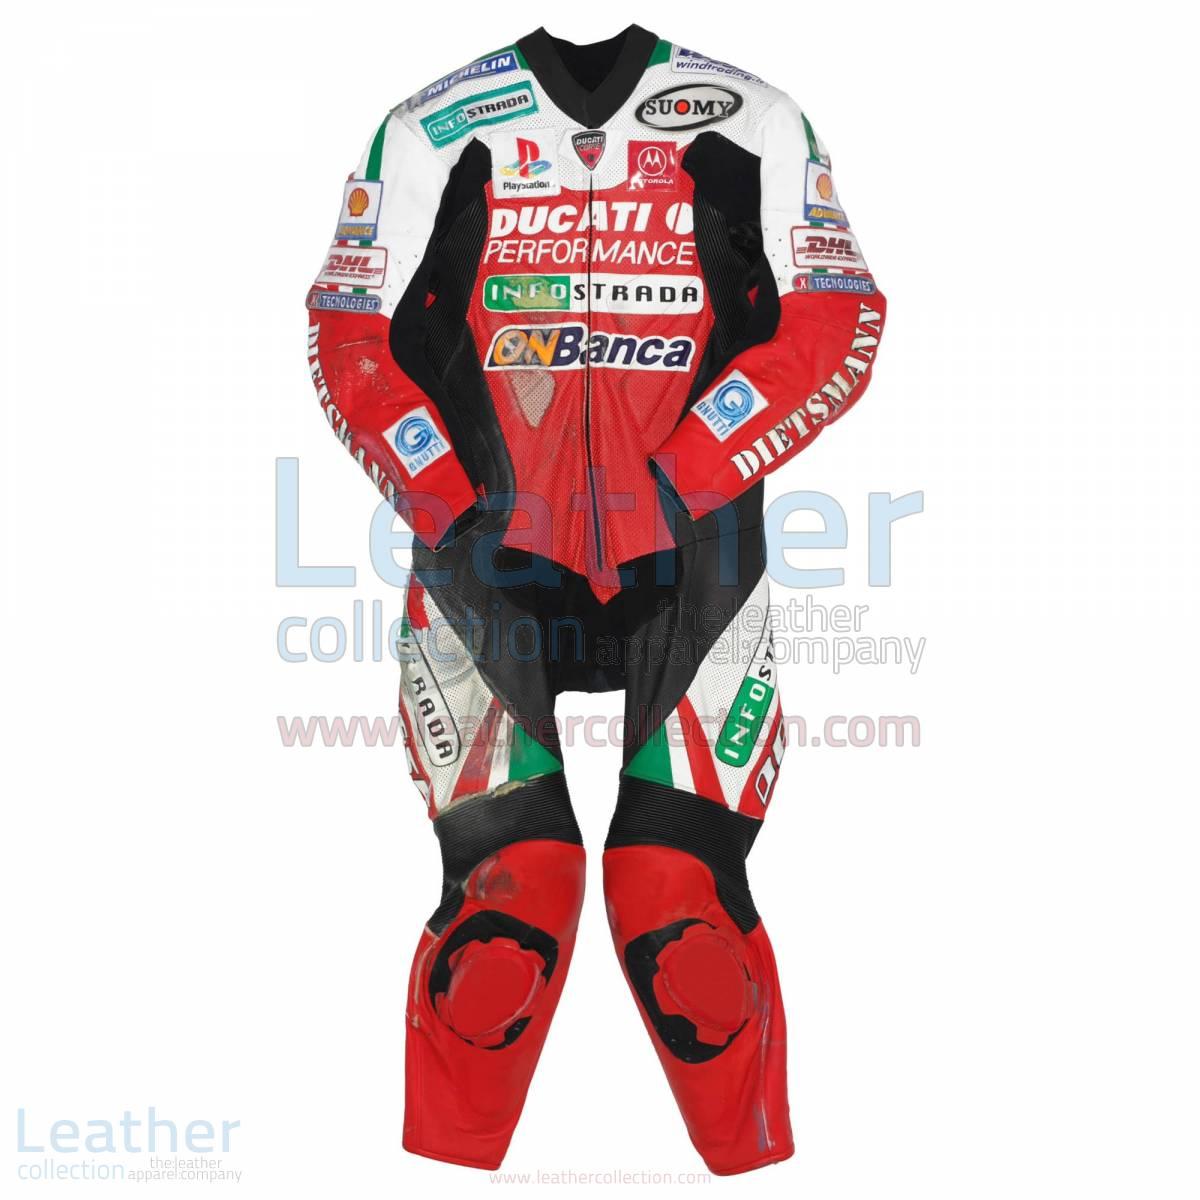 Troy Bayliss Ducati WSBK 2001 Leathers